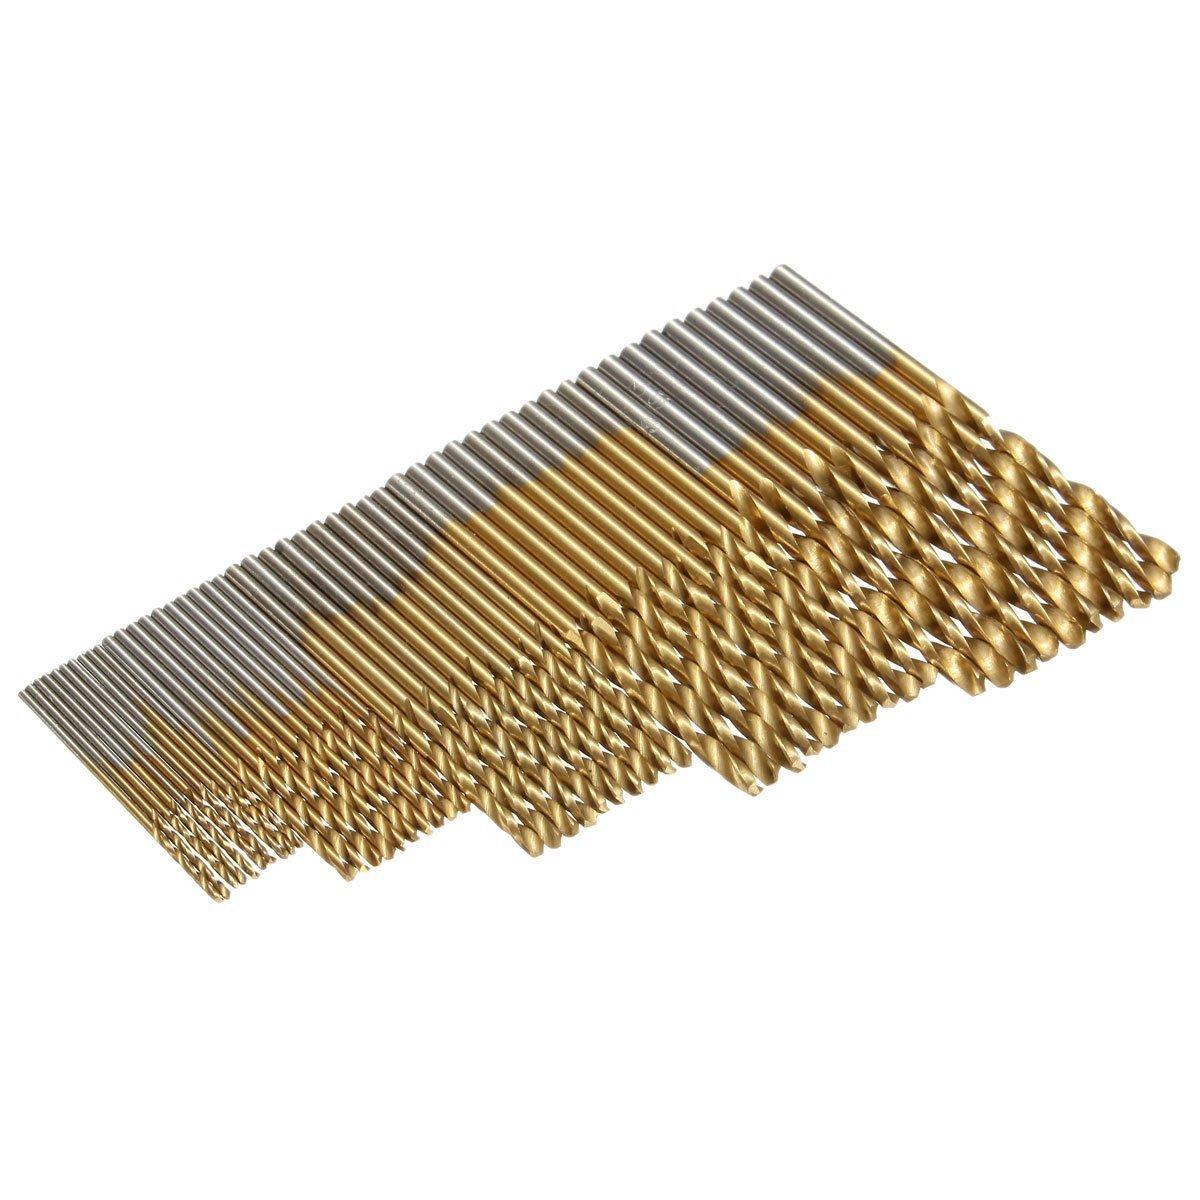 xuesiLY 50Pcs Titanium Coated HSS High Speed Steel Drill Bit Set Tool 1//1.5//2//2.5//3mm